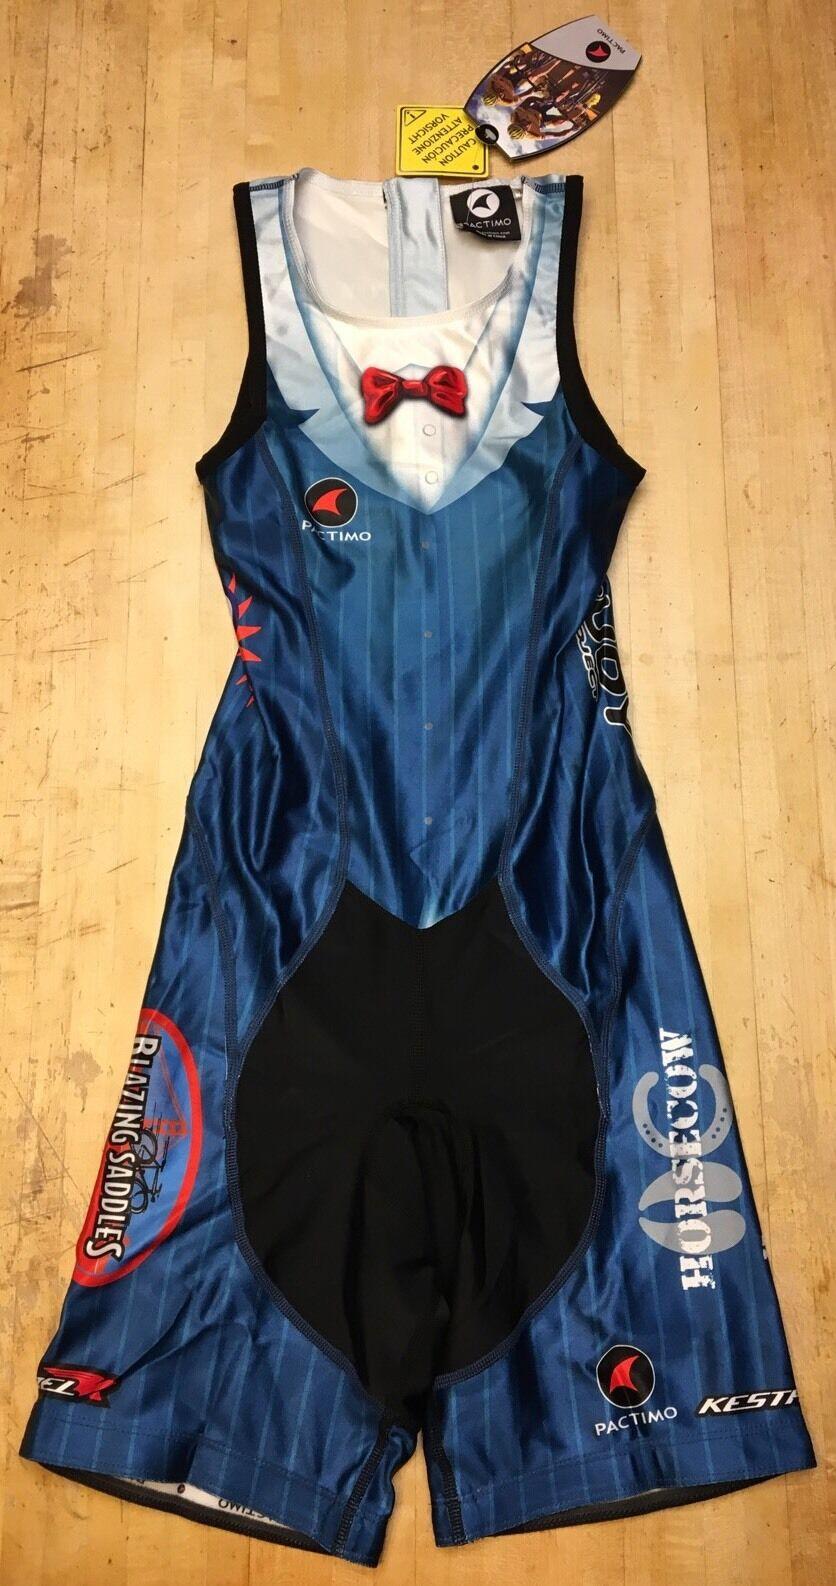 Unisex Pactimo Sleeveless FullSuit SkinSuit One Piece Cycling Garment XS